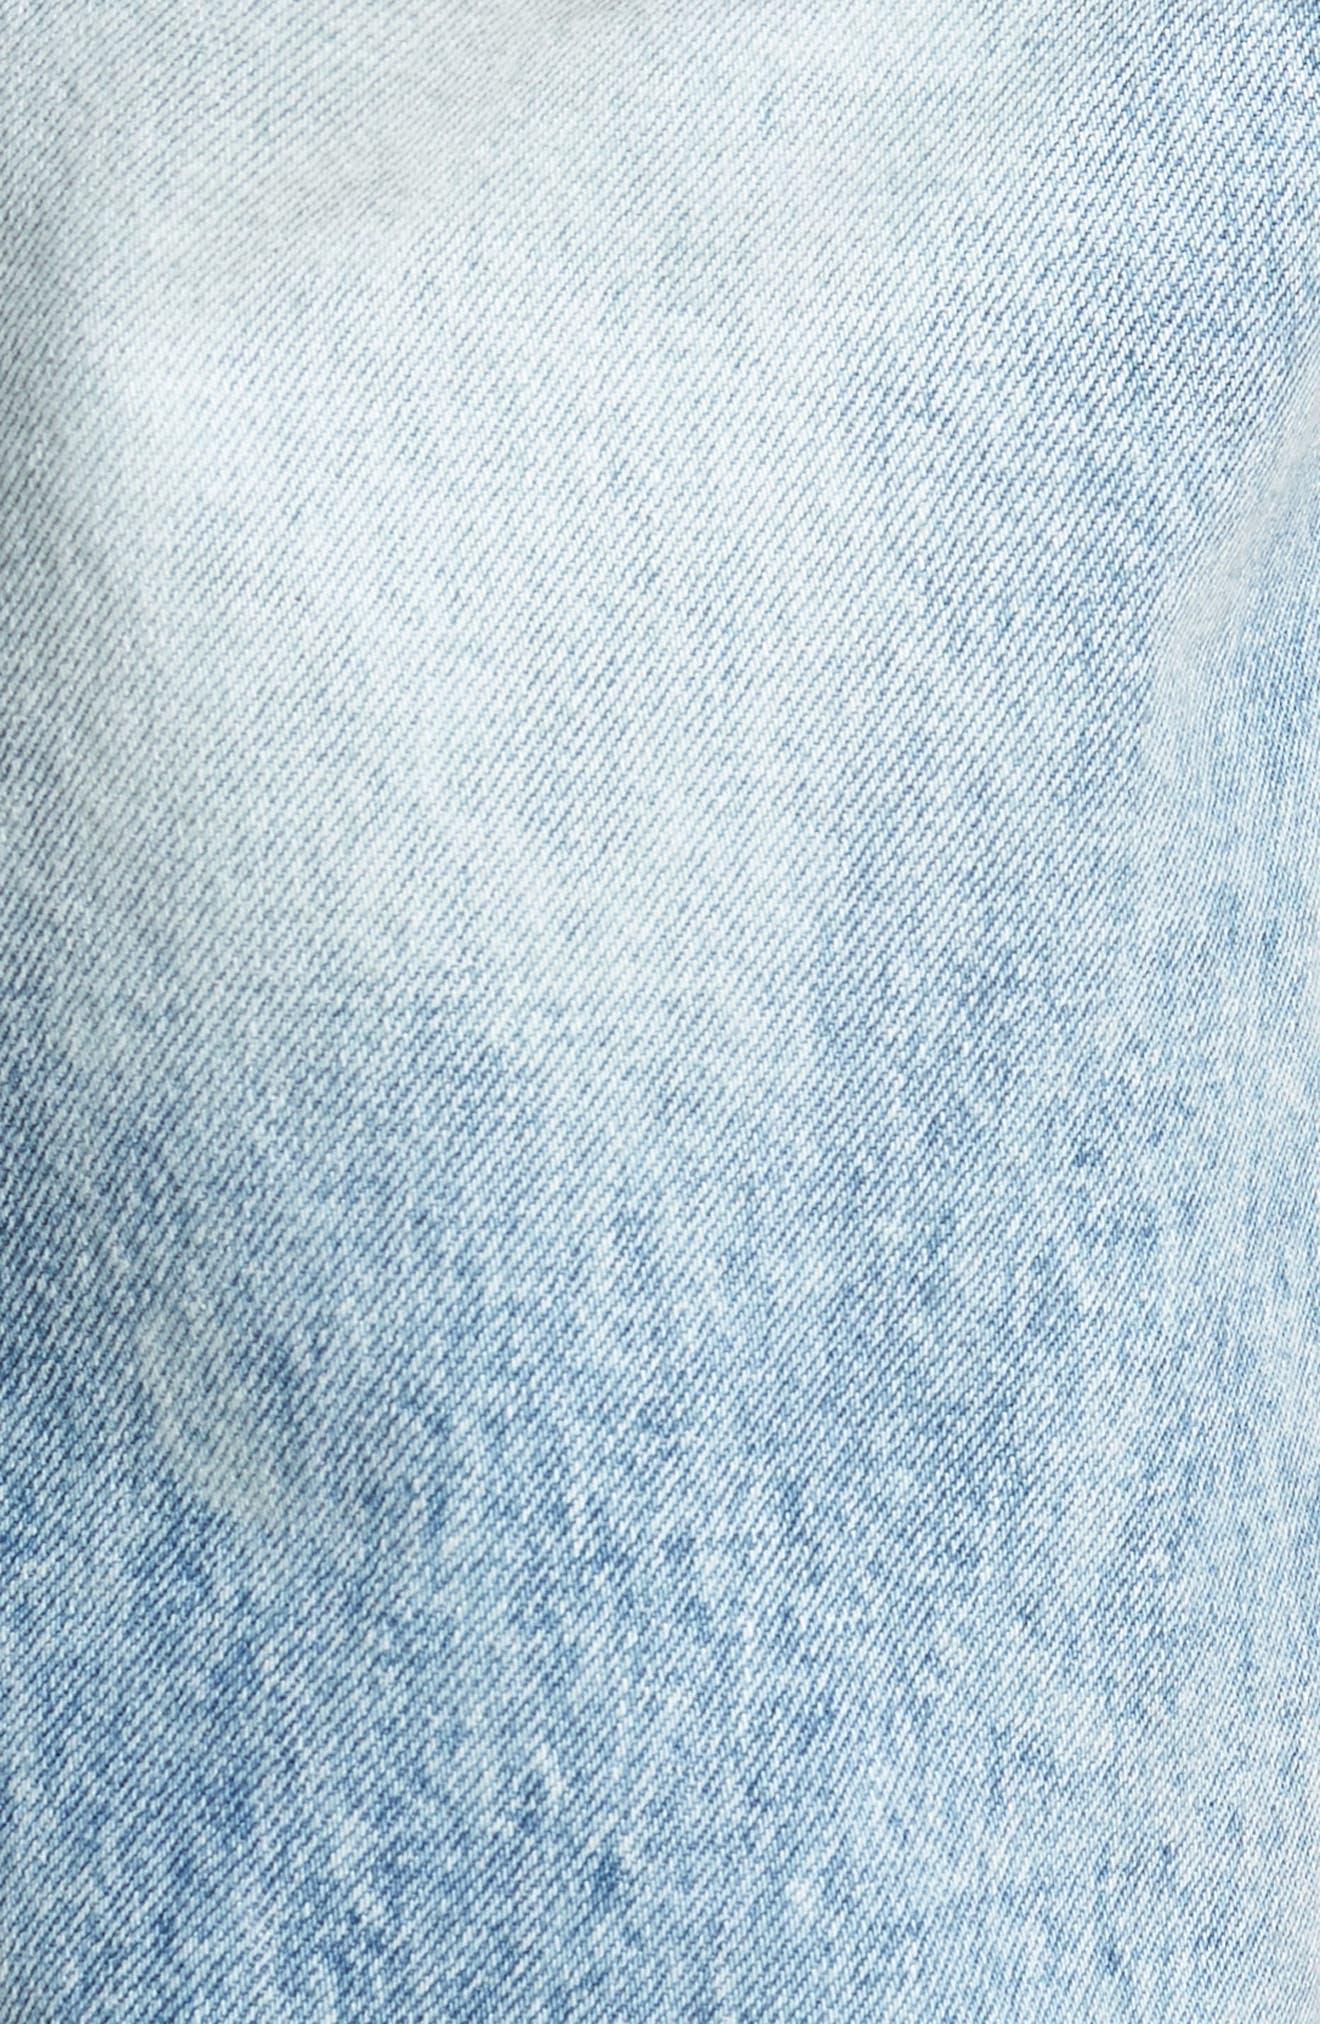 Otis Straight Leg Jeans,                             Alternate thumbnail 5, color,                             Light Blue Wash